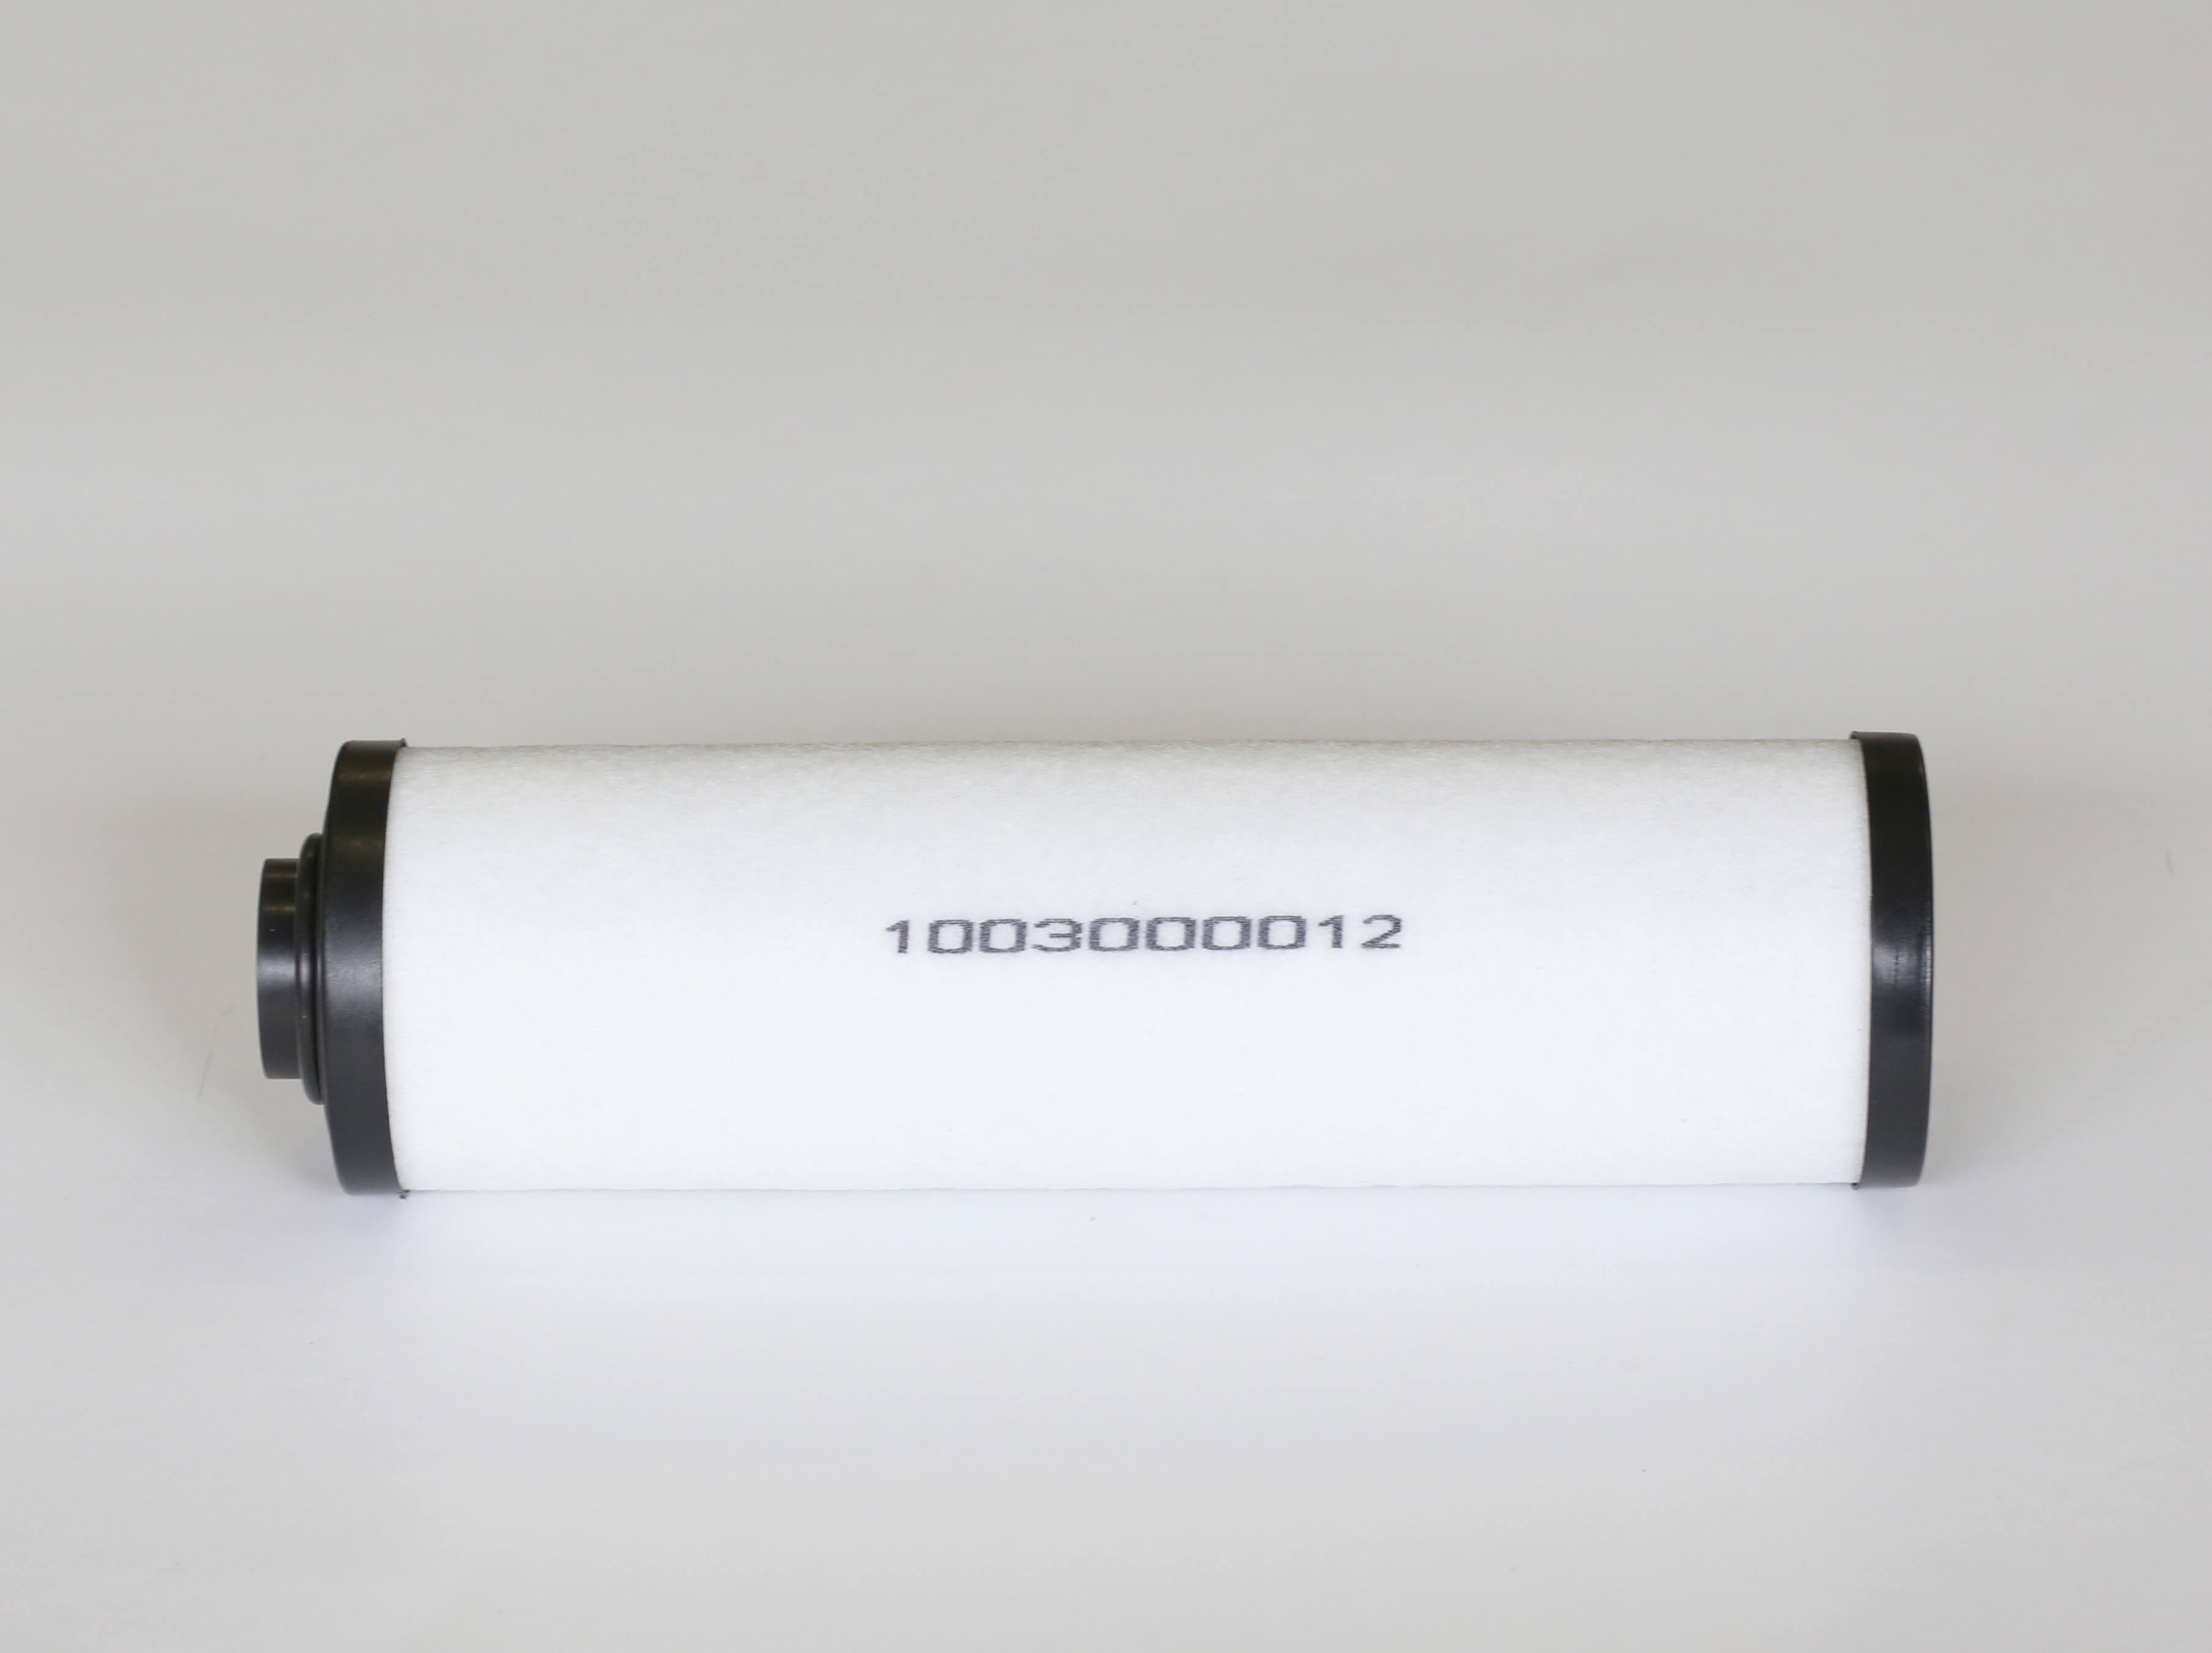 Busch vacuum pump oil separator